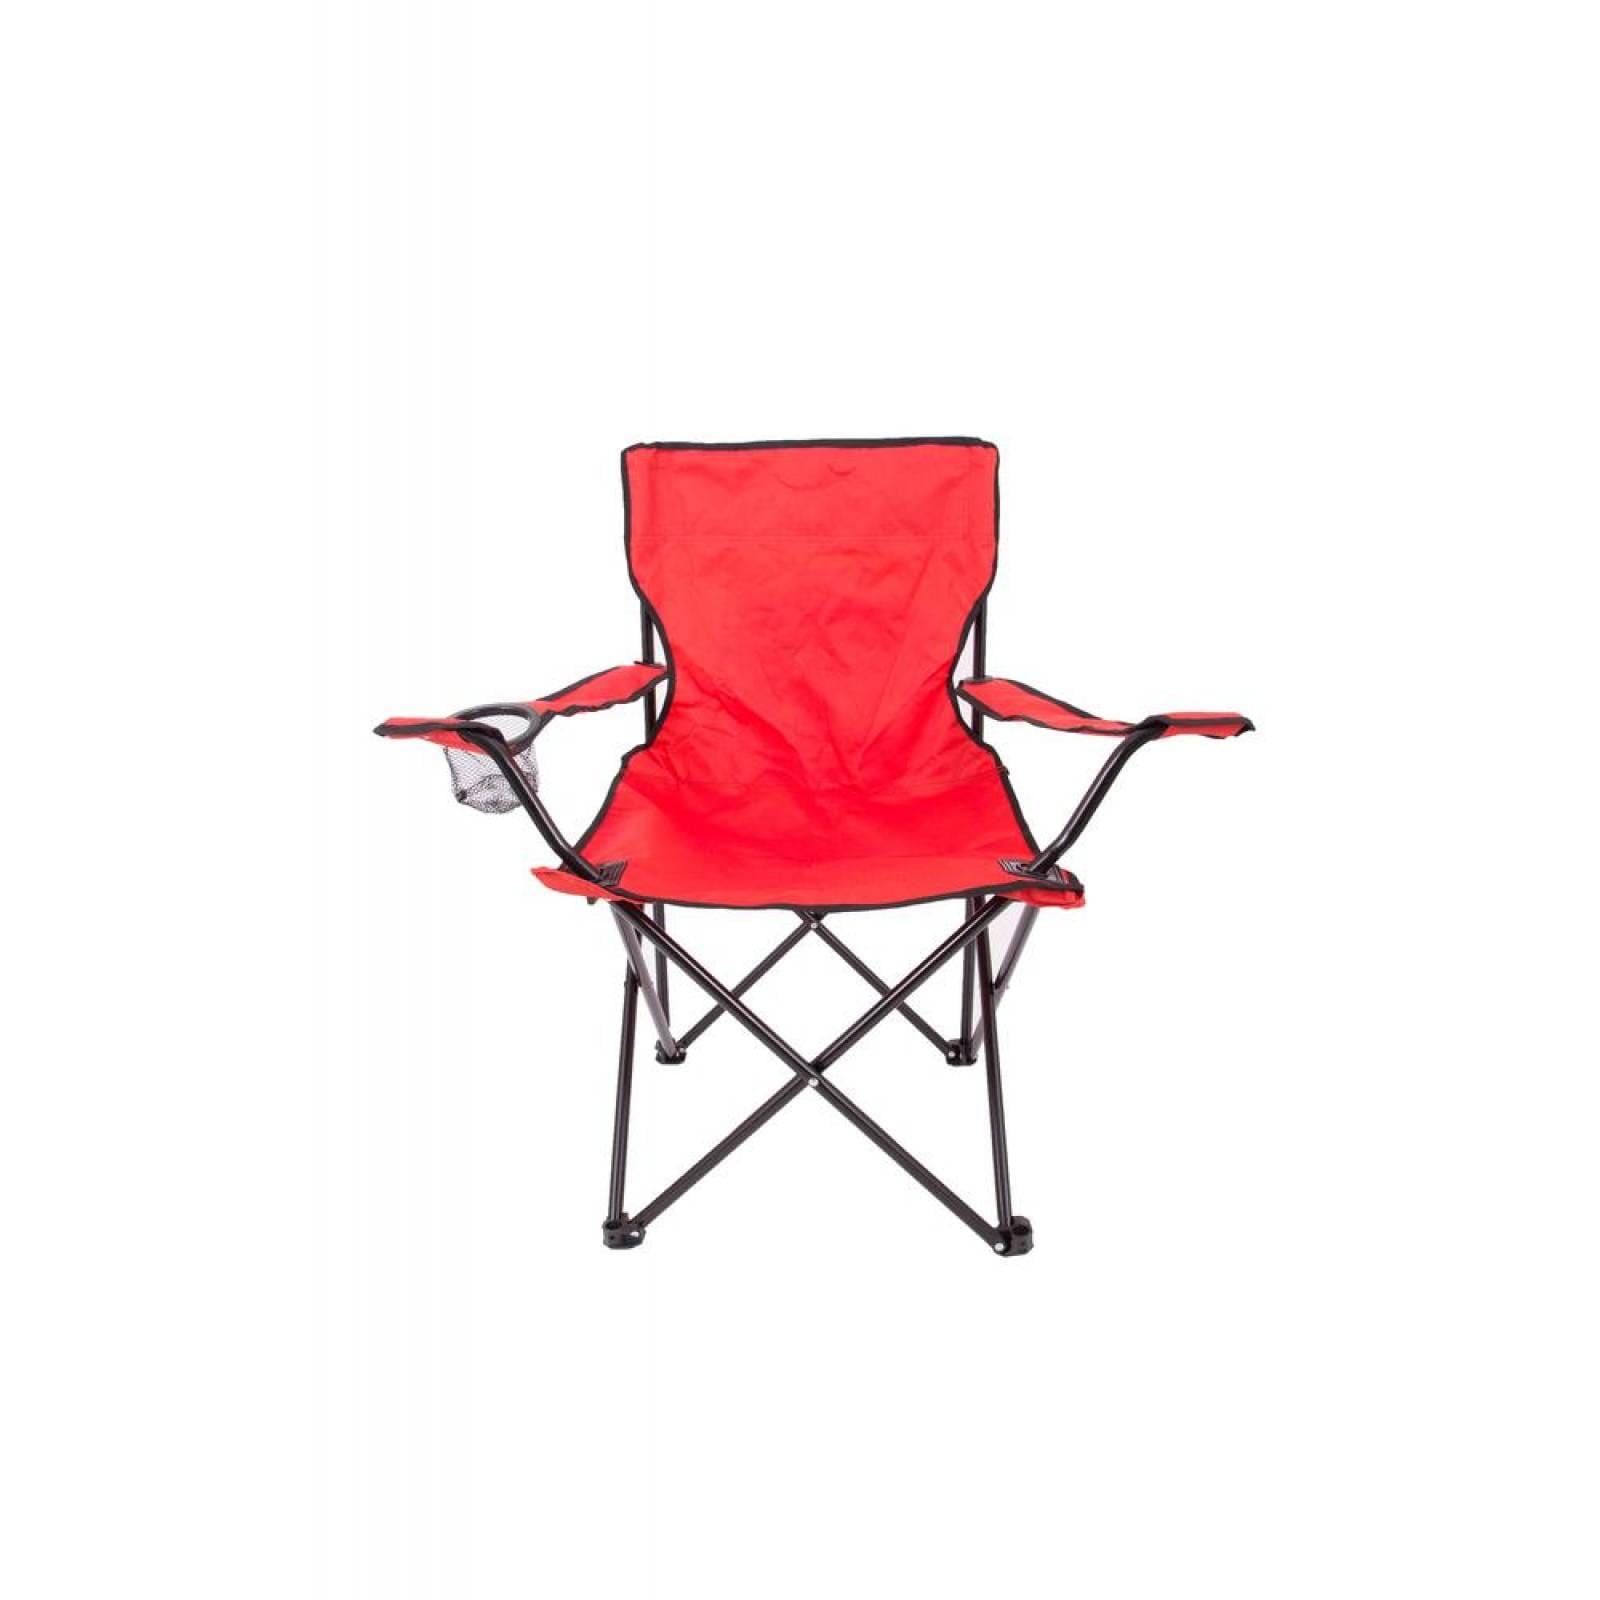 Set de 4 sillas plegables básicas FSSP01